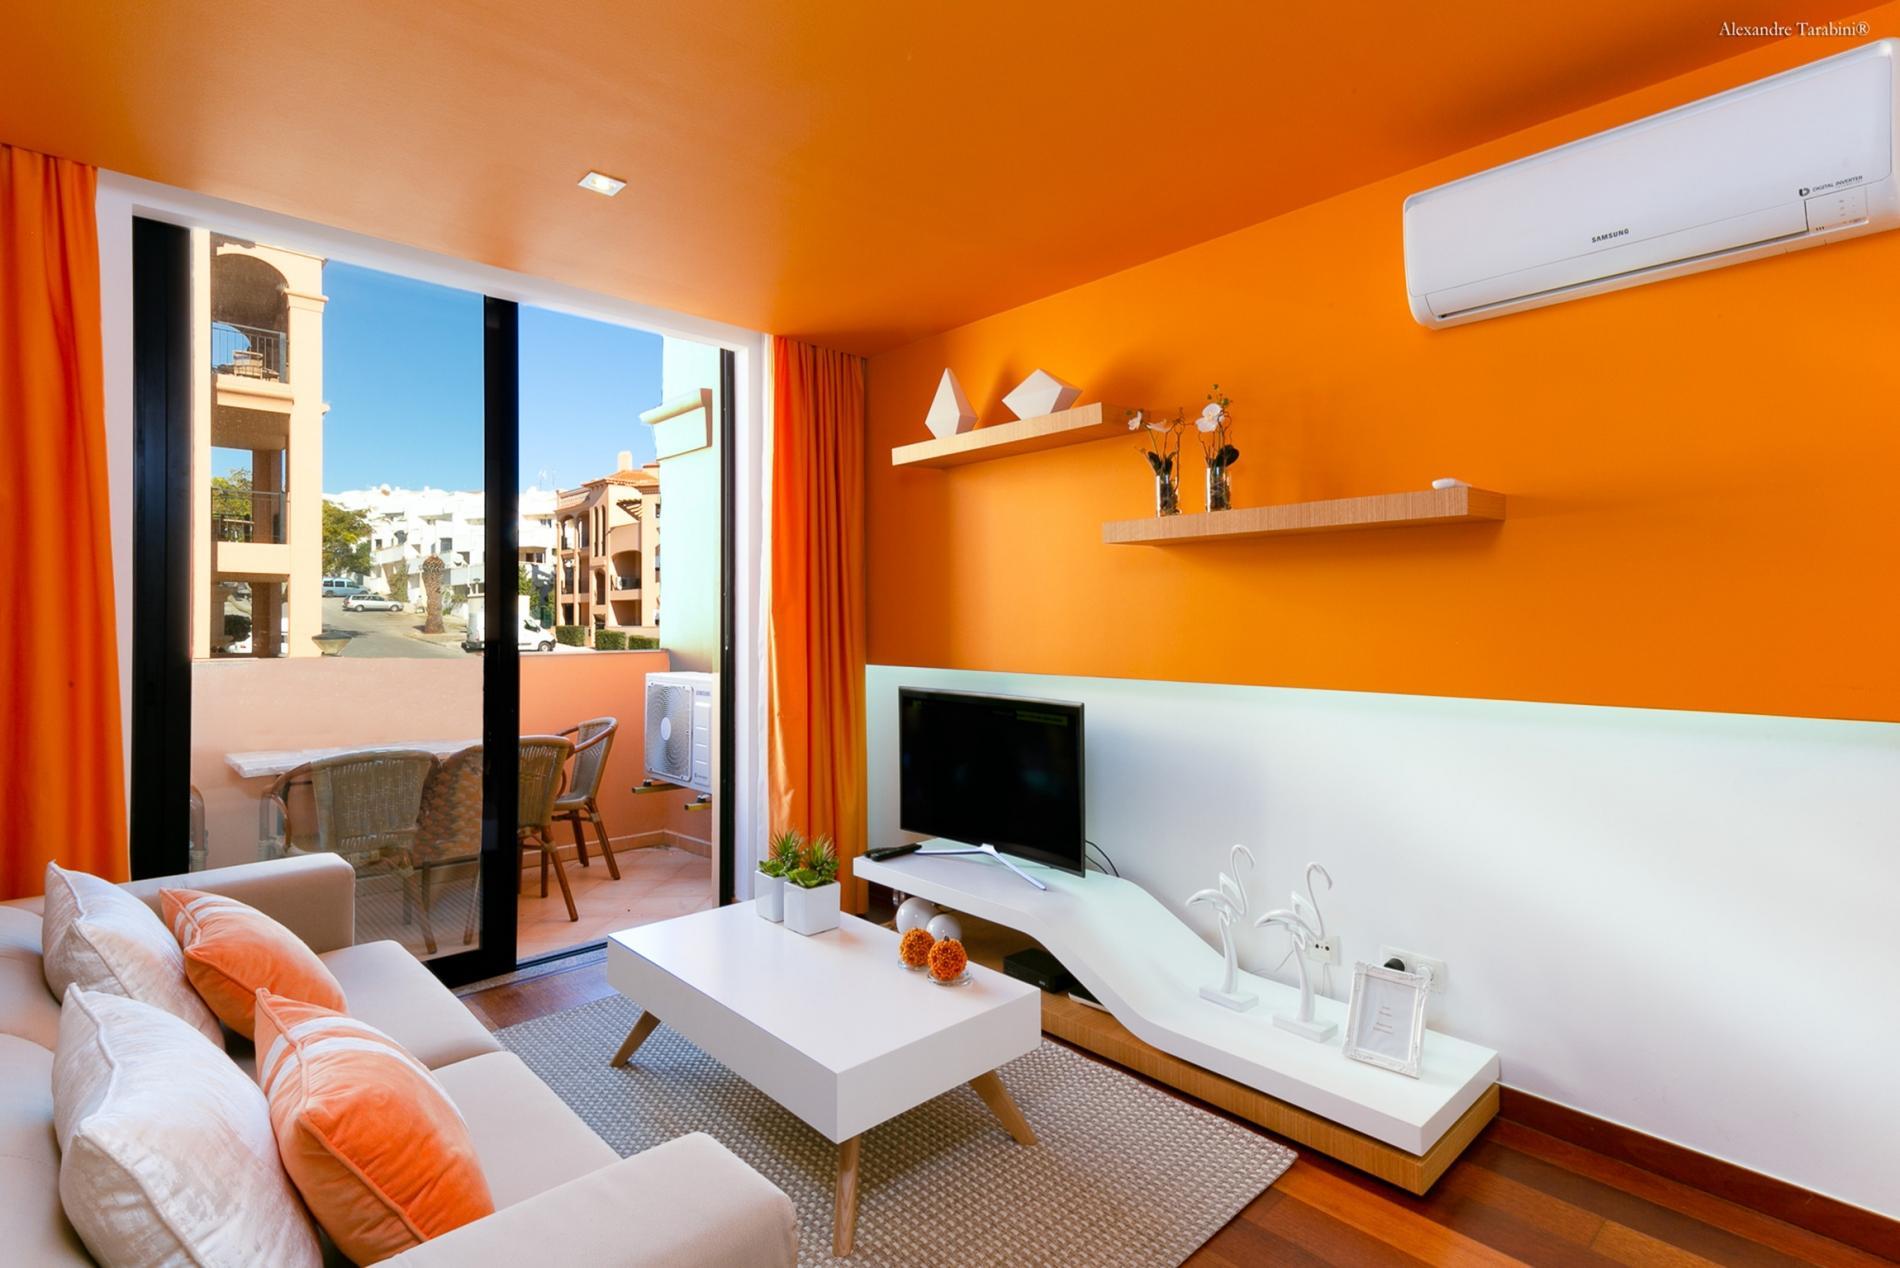 Ferienwohnung B29 - LuzBay Duplex (2558092), Luz, , Algarve, Portugal, Bild 2